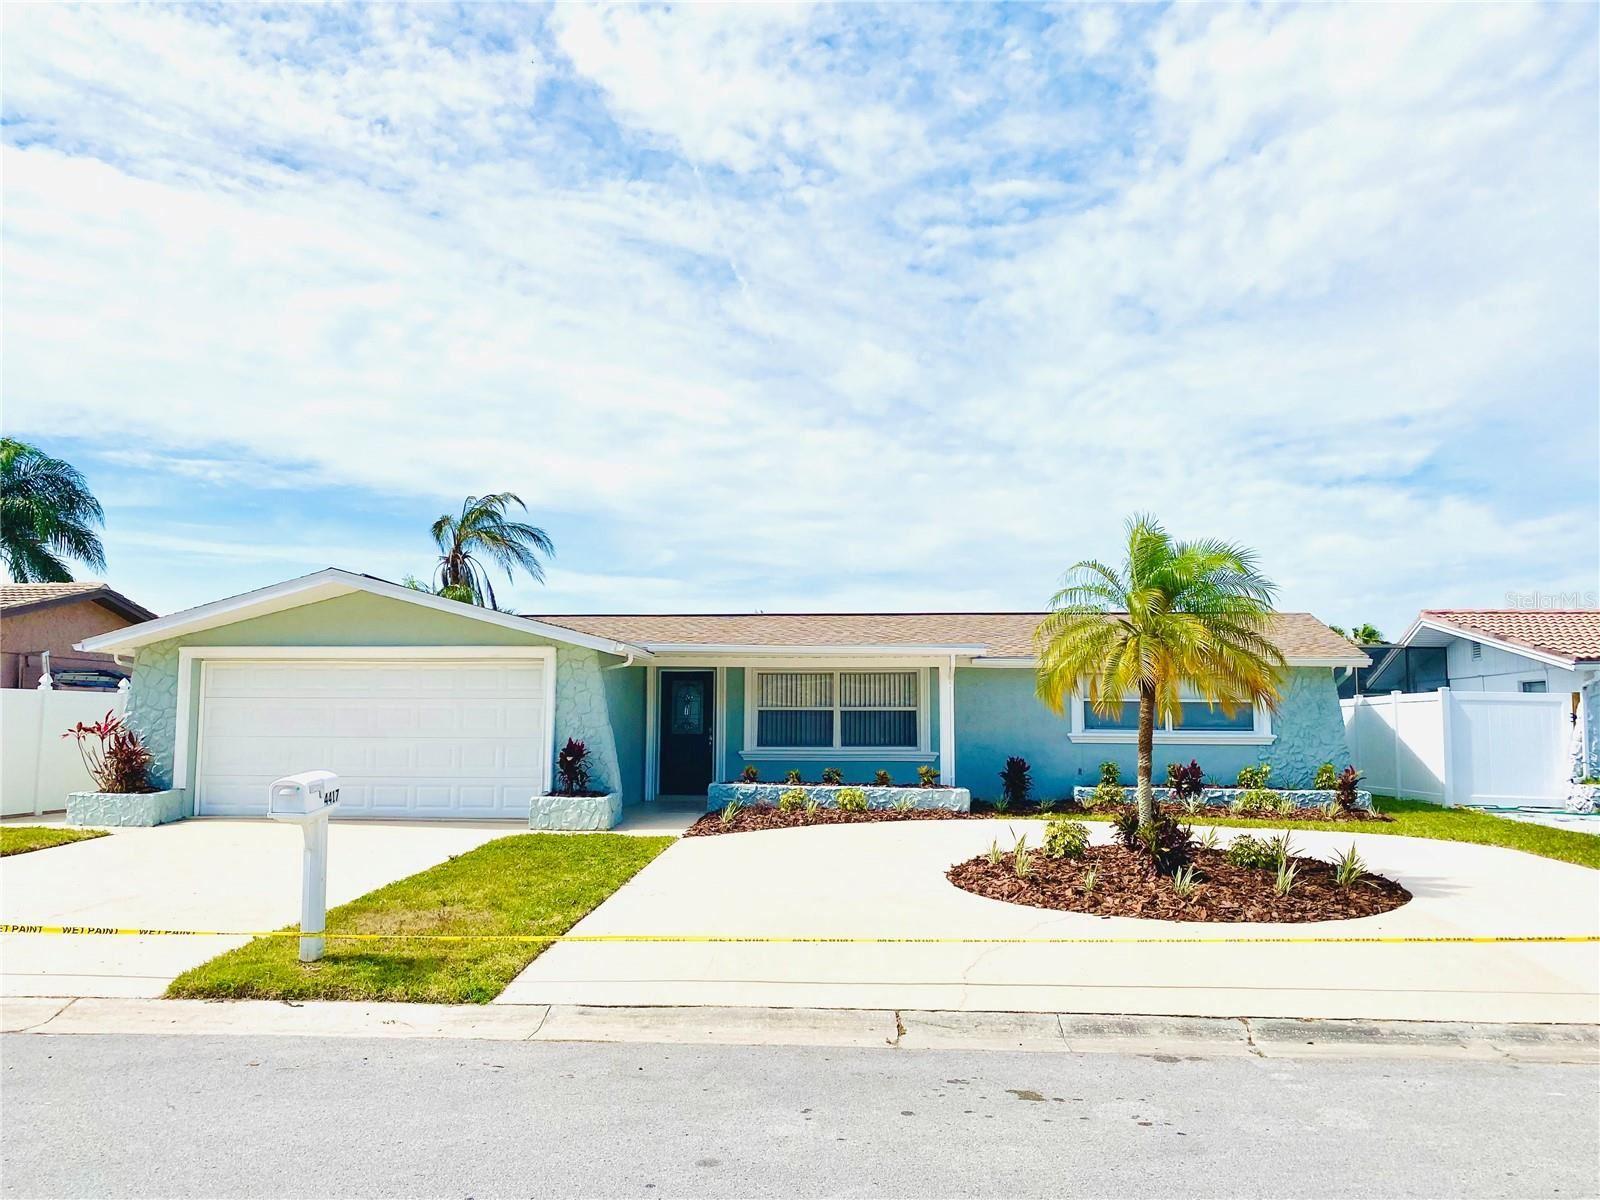 4417 RUDDER WAY, New Port Richey, FL 34652 - MLS#: W7833538